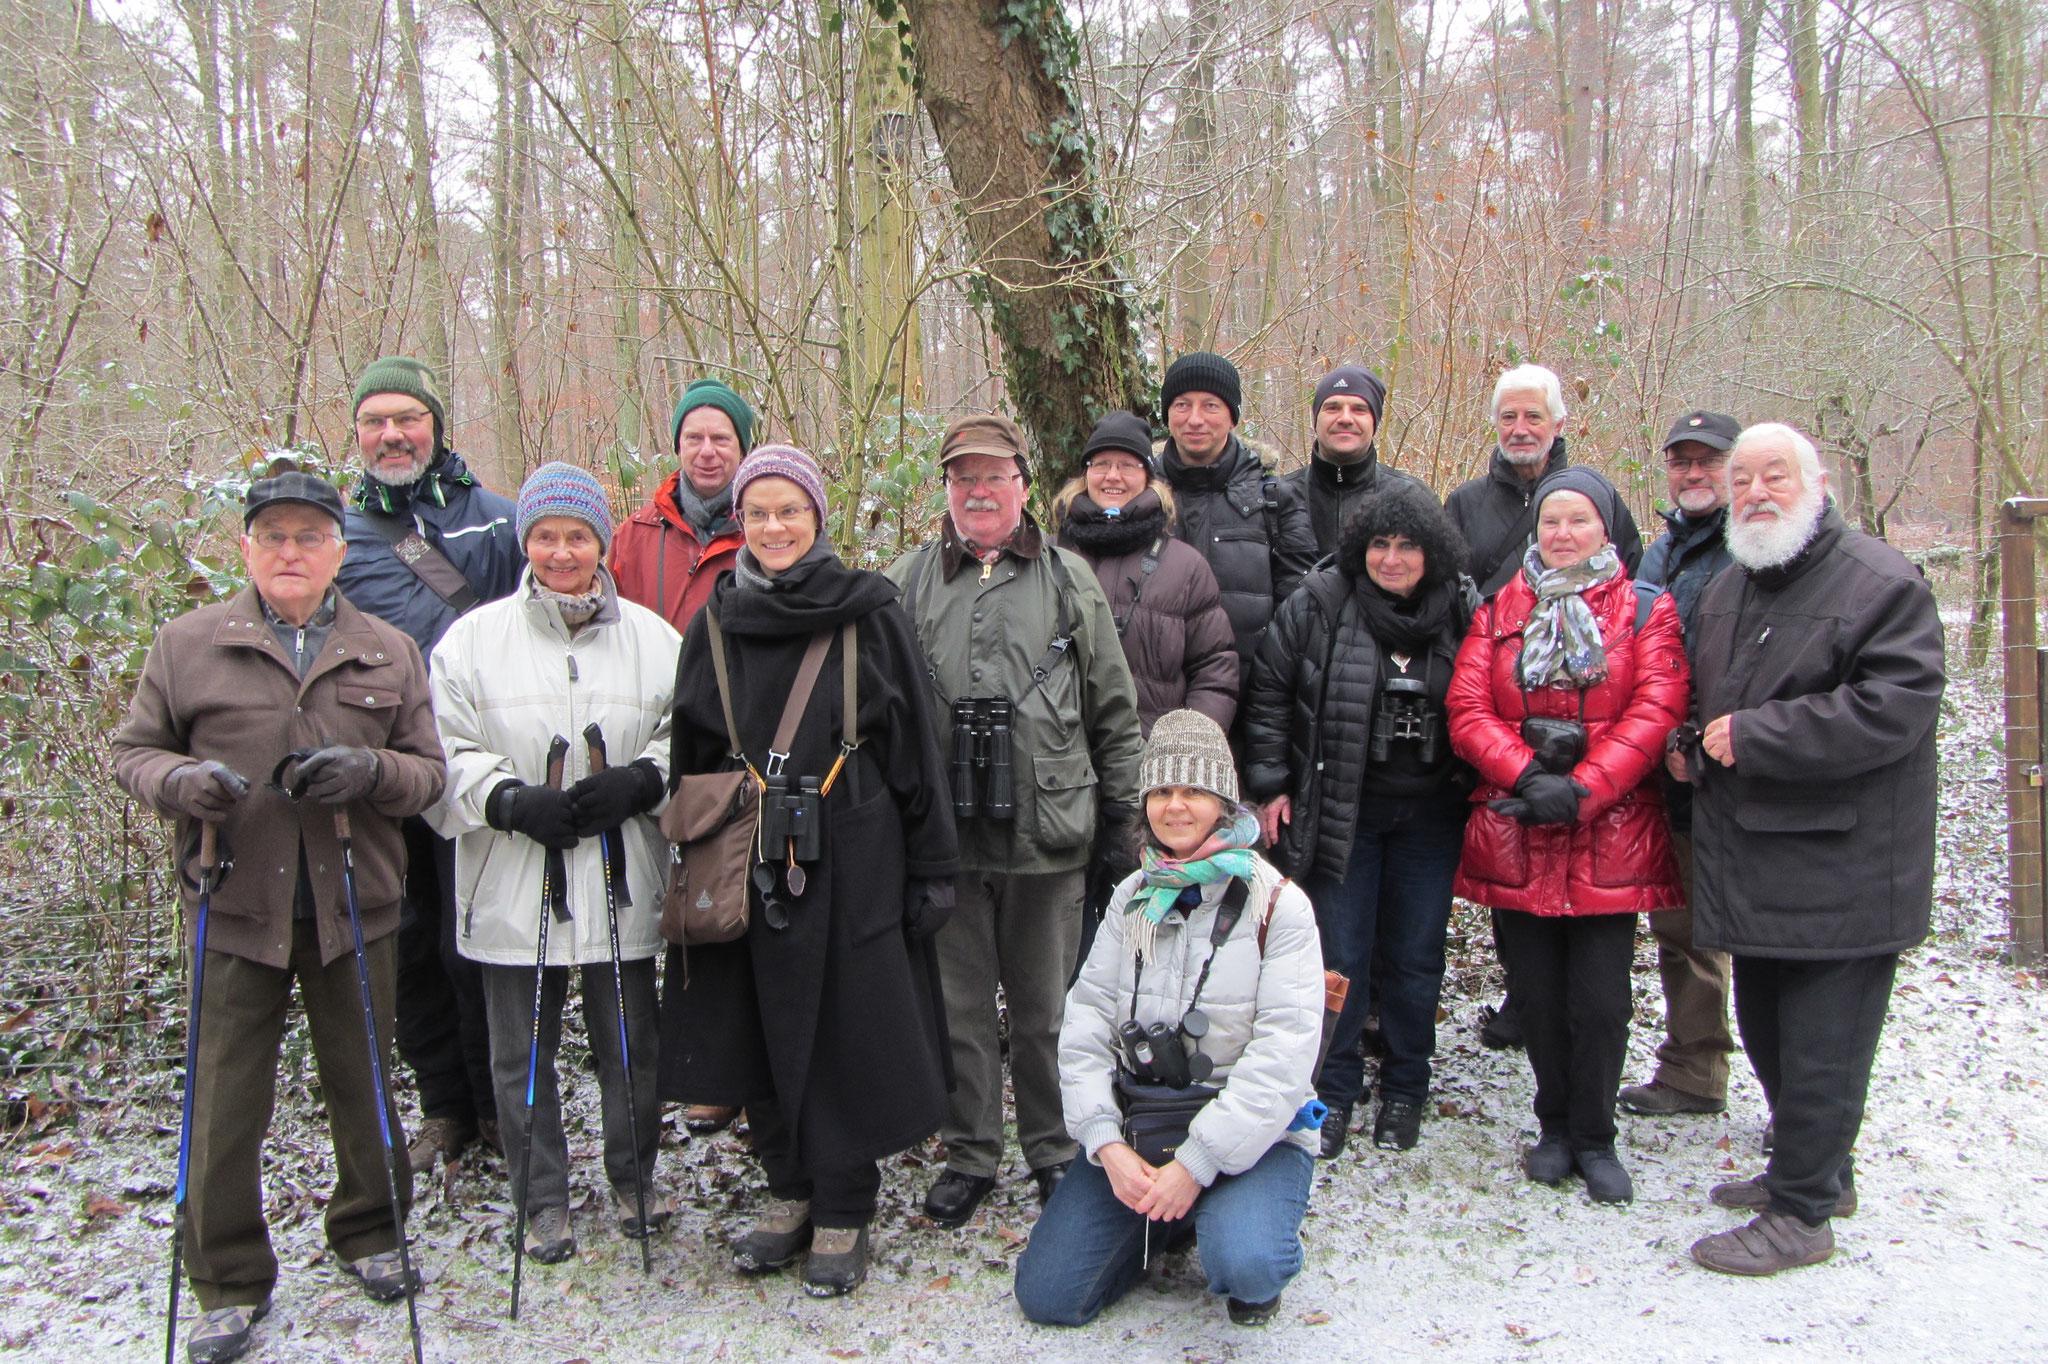 Winterwanderung Foto: Miriam Kodek